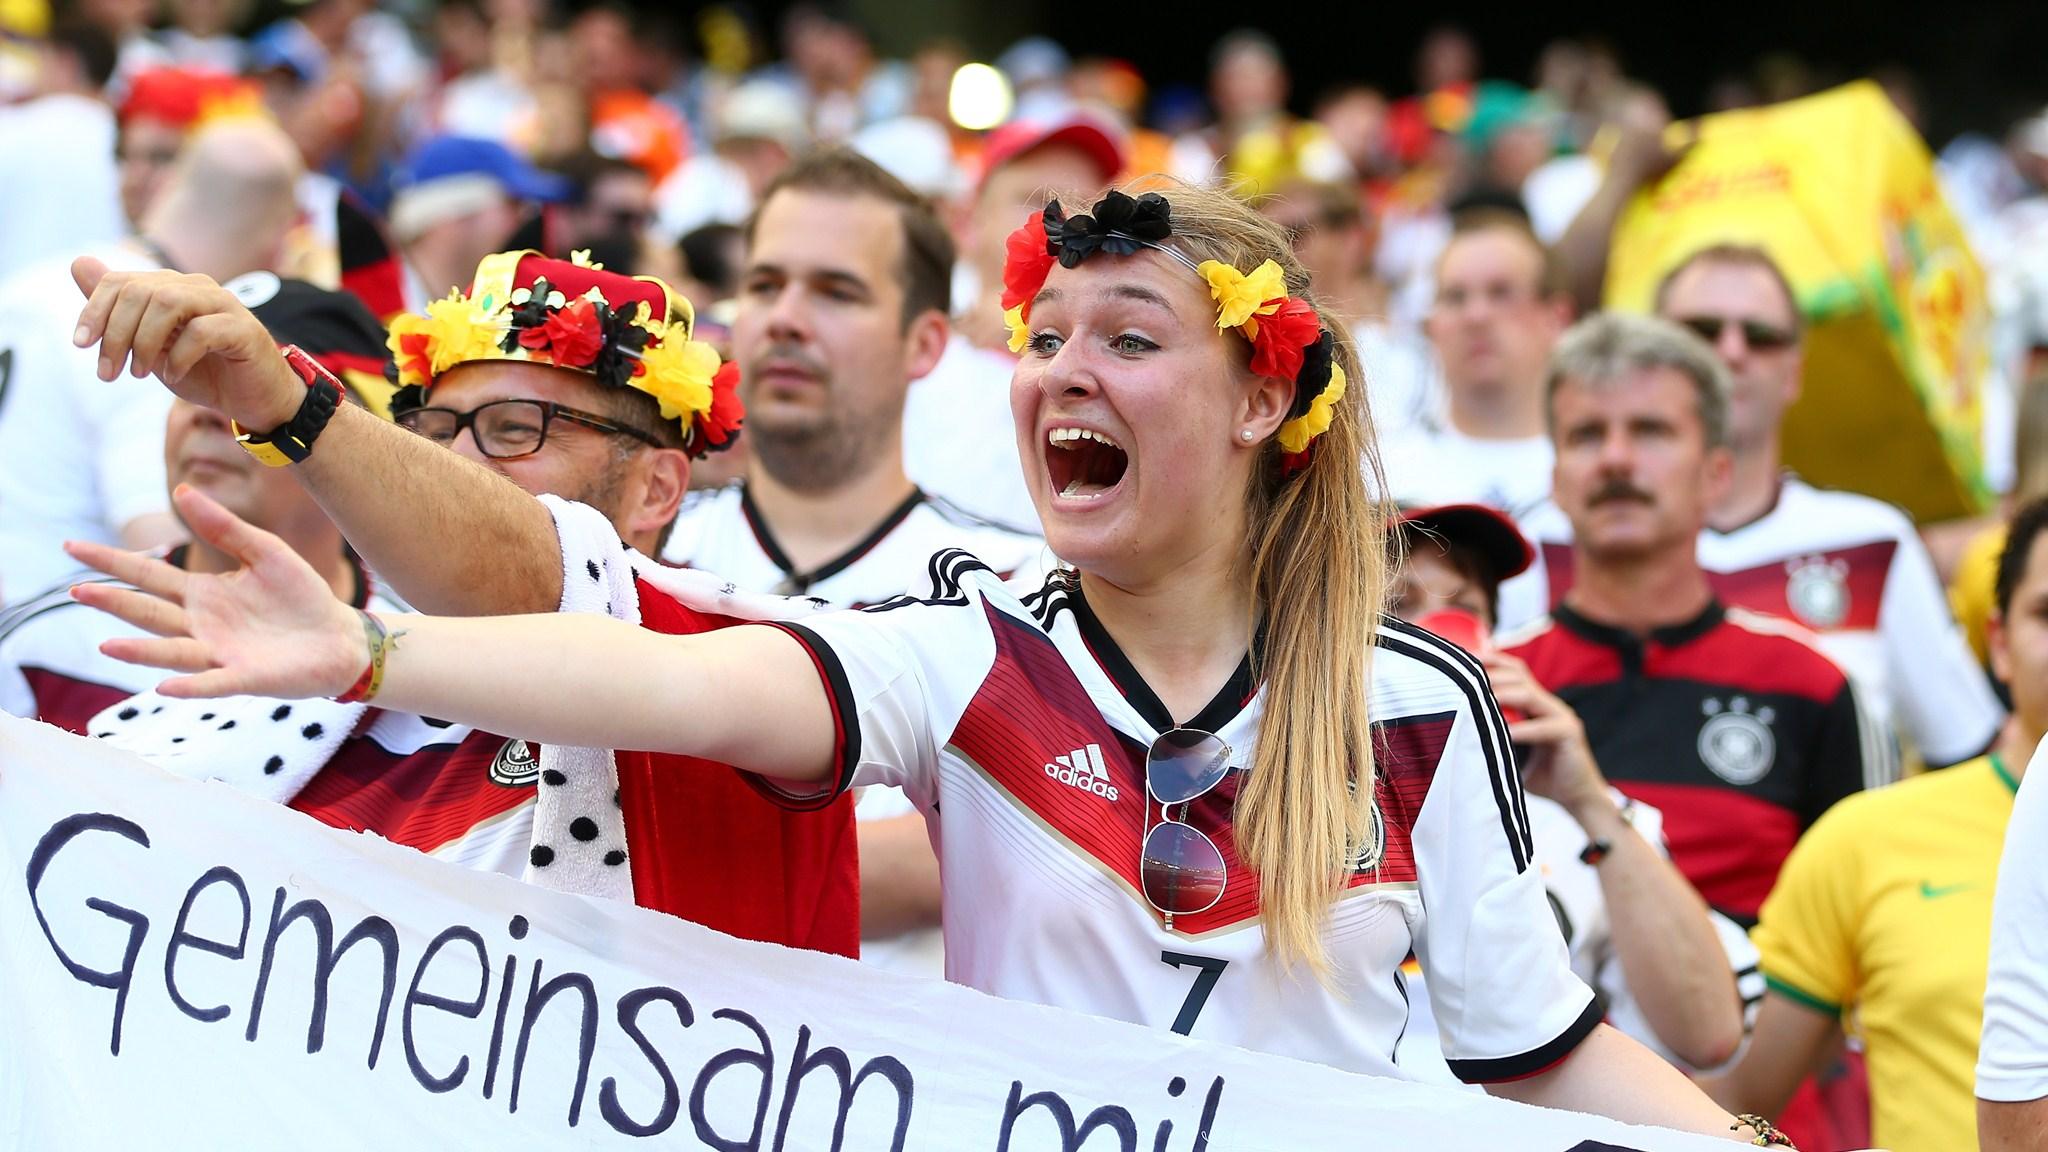 111 - Germany-Portugal [4-0] -- 16 Jun 2014 - 13-00 -- Salvador - Arena Fonte Nova